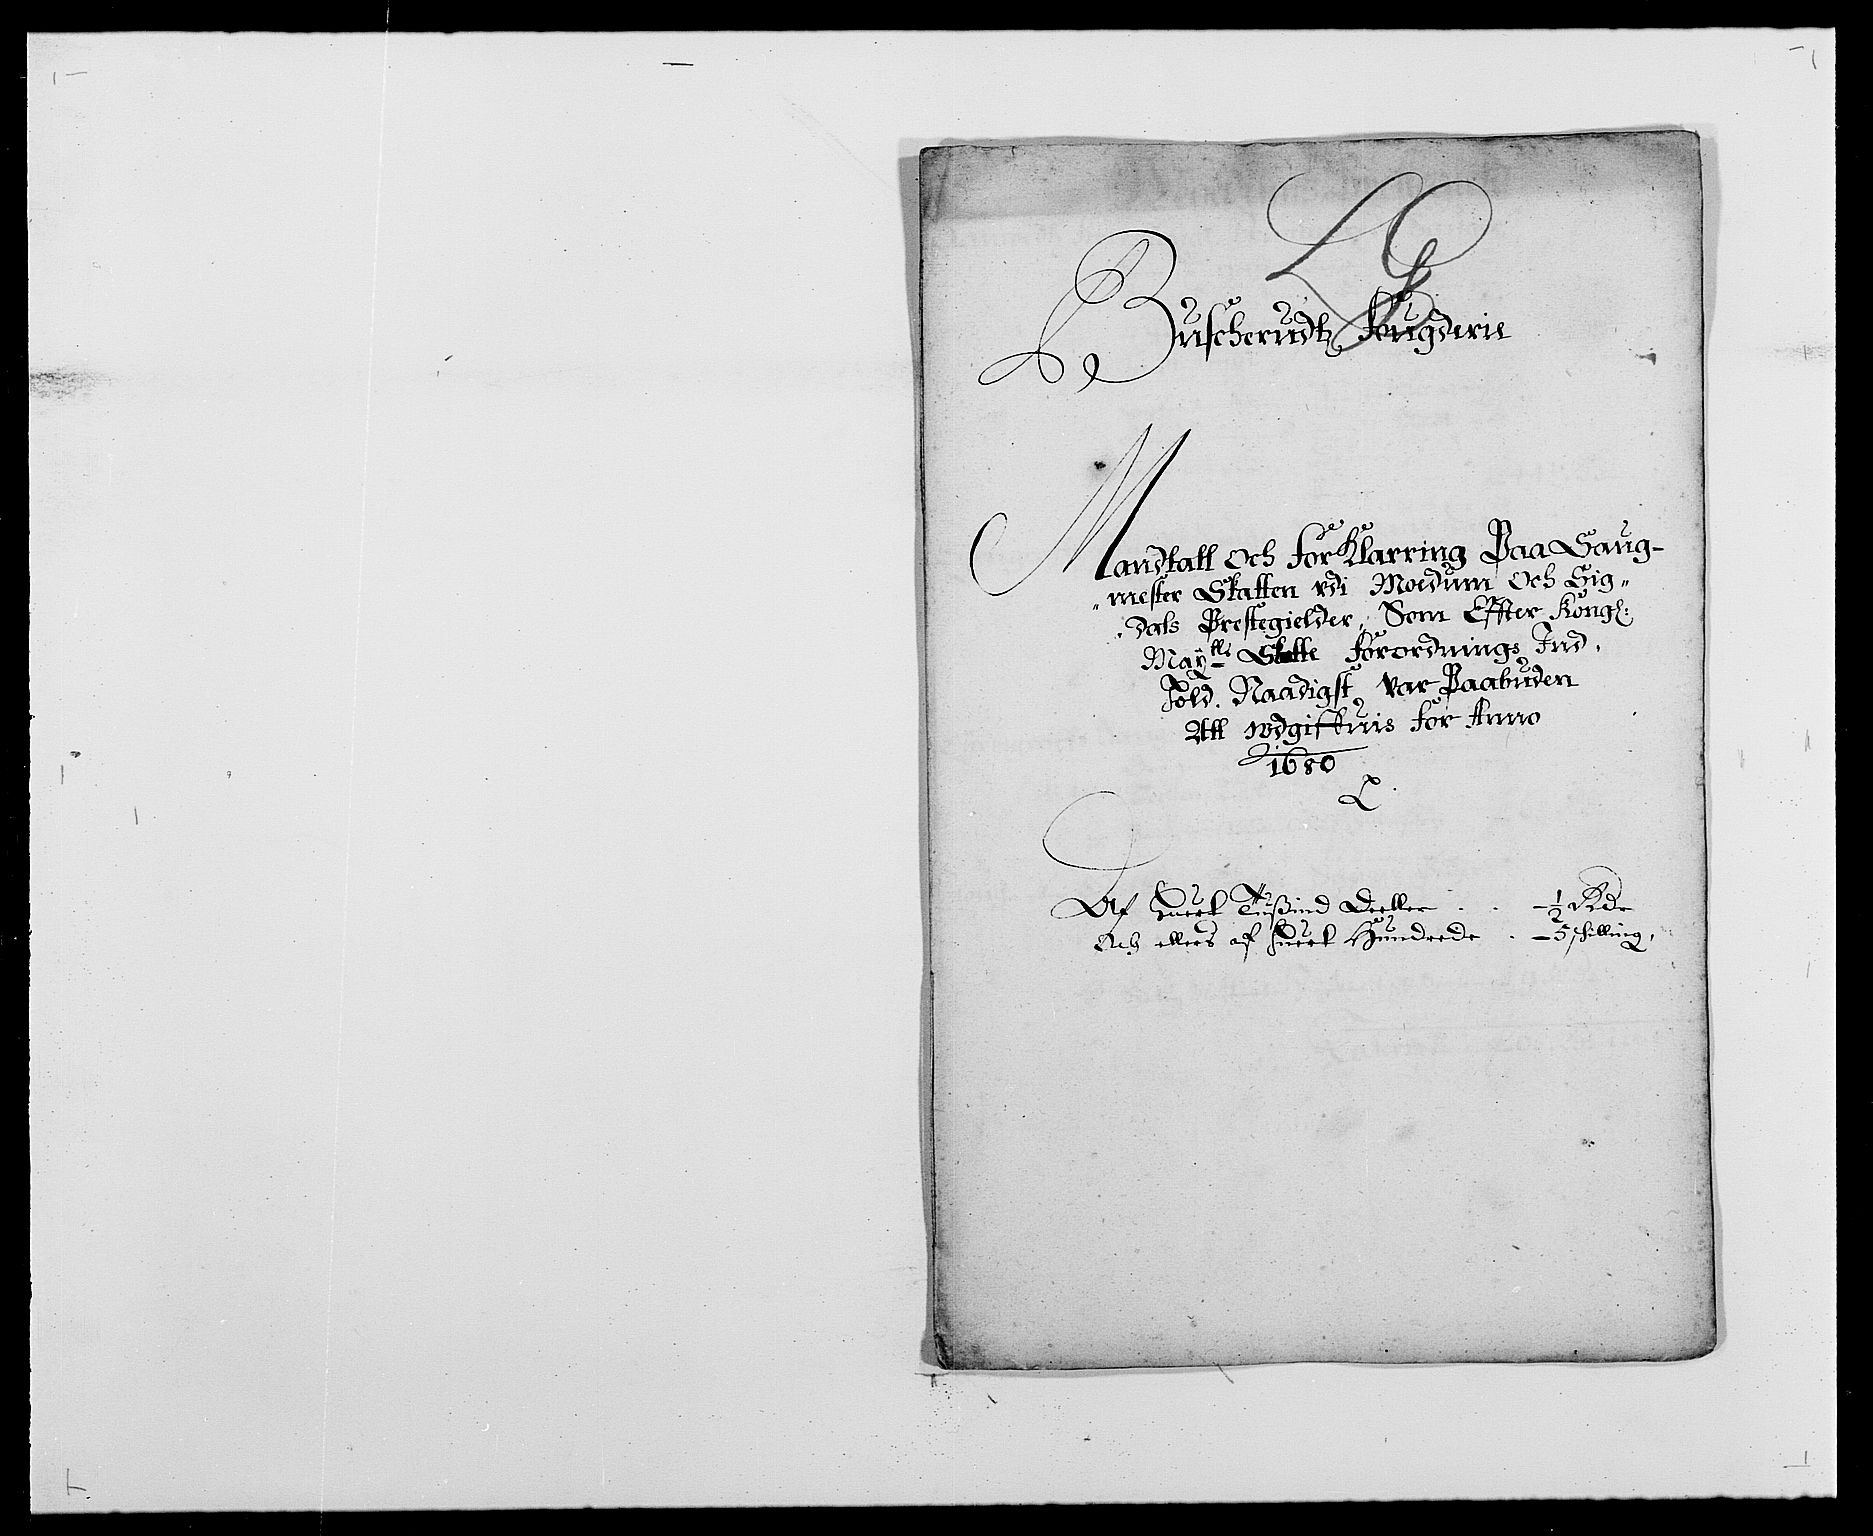 RA, Rentekammeret inntil 1814, Reviderte regnskaper, Fogderegnskap, R25/L1675: Fogderegnskap Buskerud, 1678-1681, s. 147